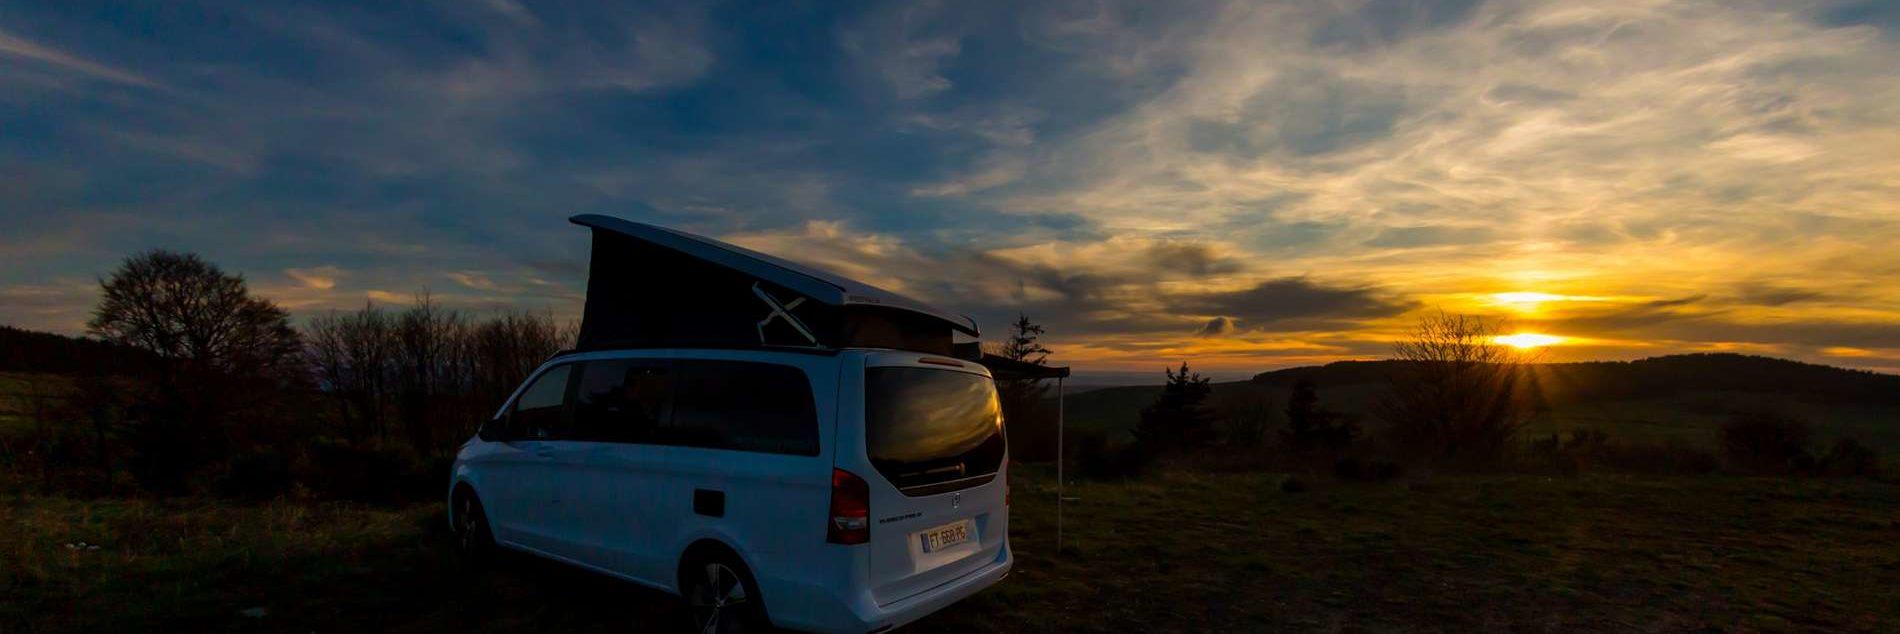 onyvan-road-trips-ardeche-van-amenage-aspect-ratio-1800-600